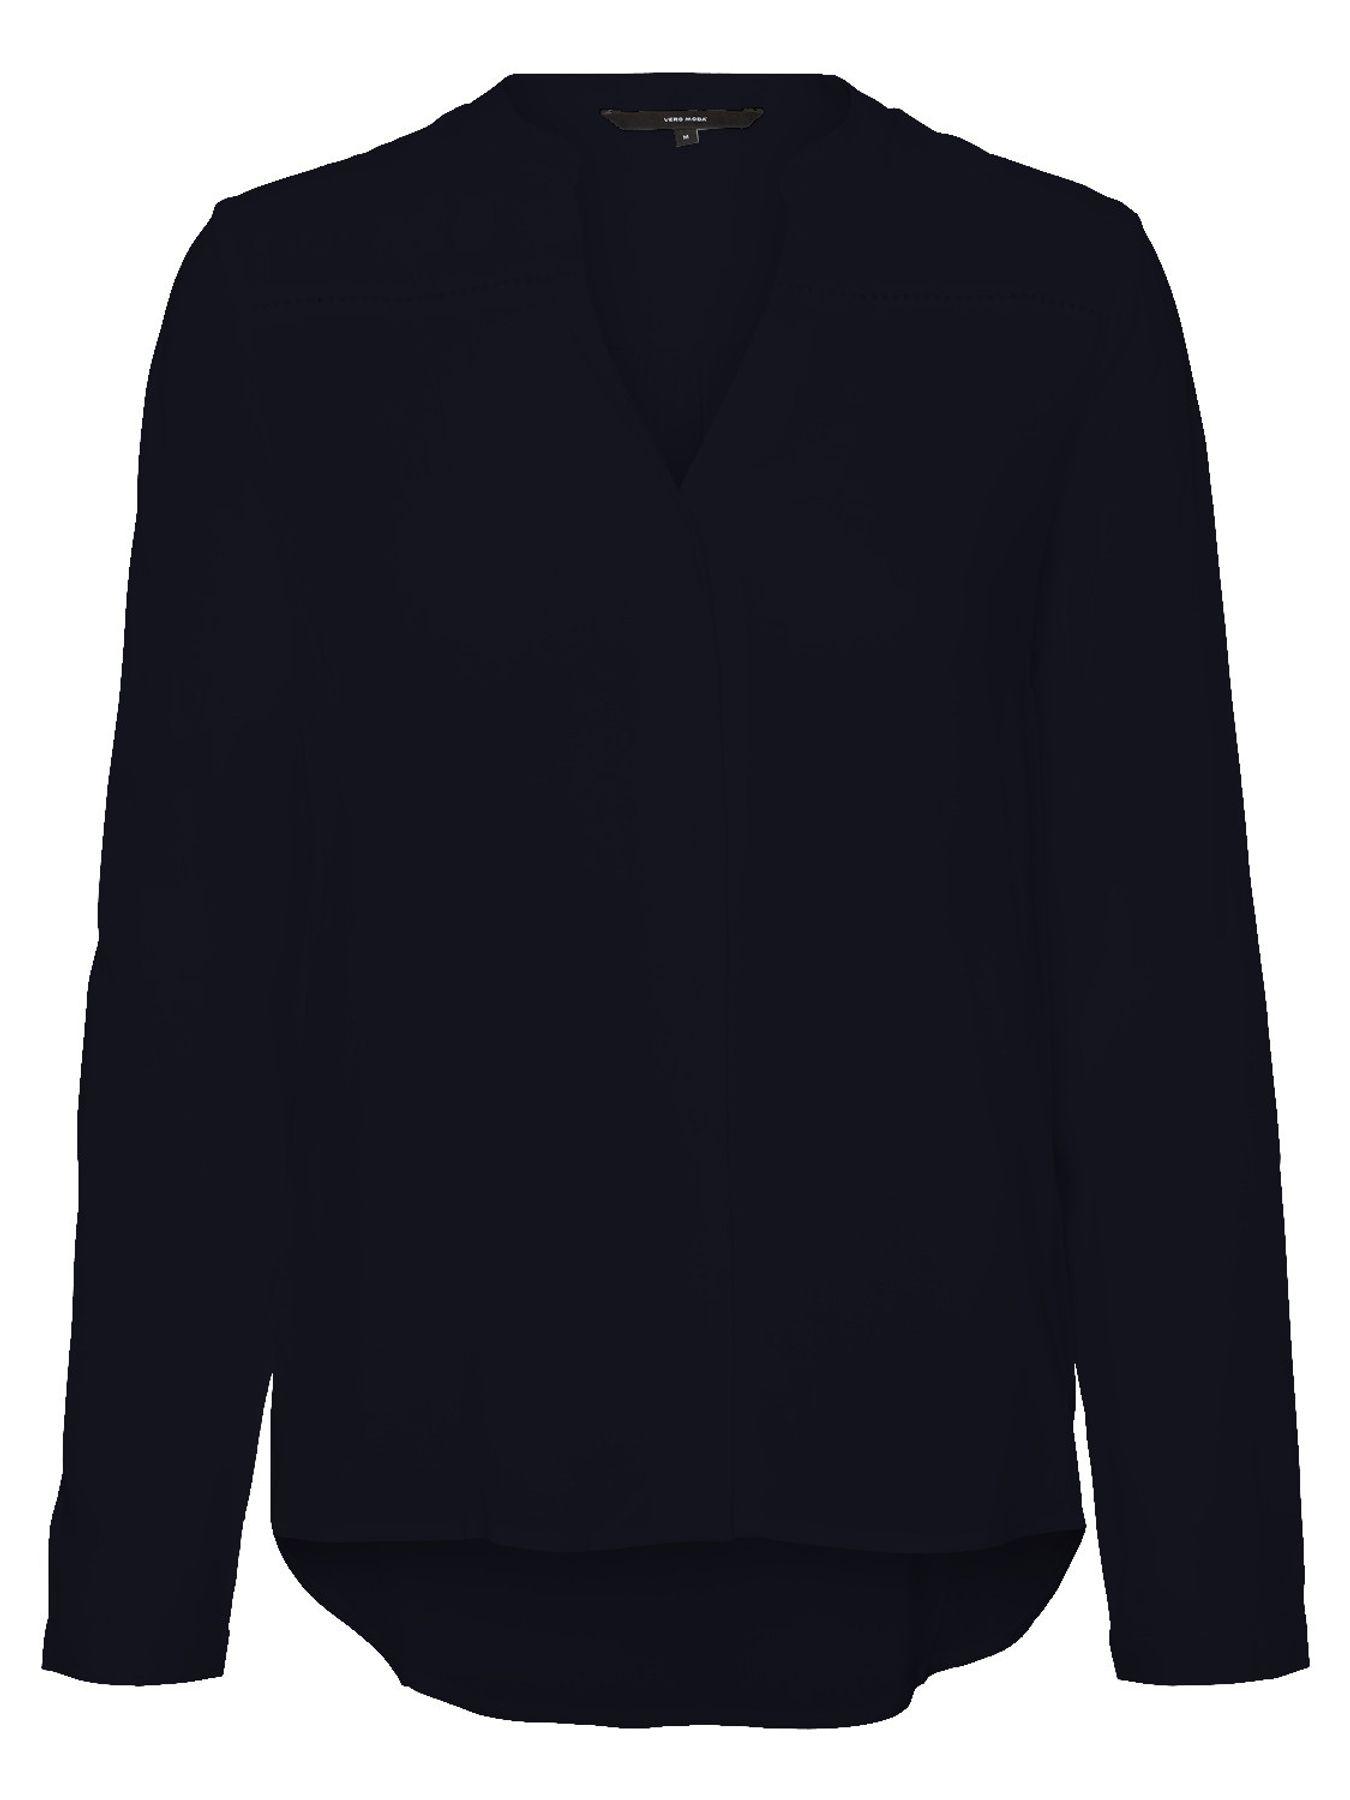 Vero Moda - Damen Bluse mit V Ausschnitt, VMSANDRA (10208427) – Bild 3